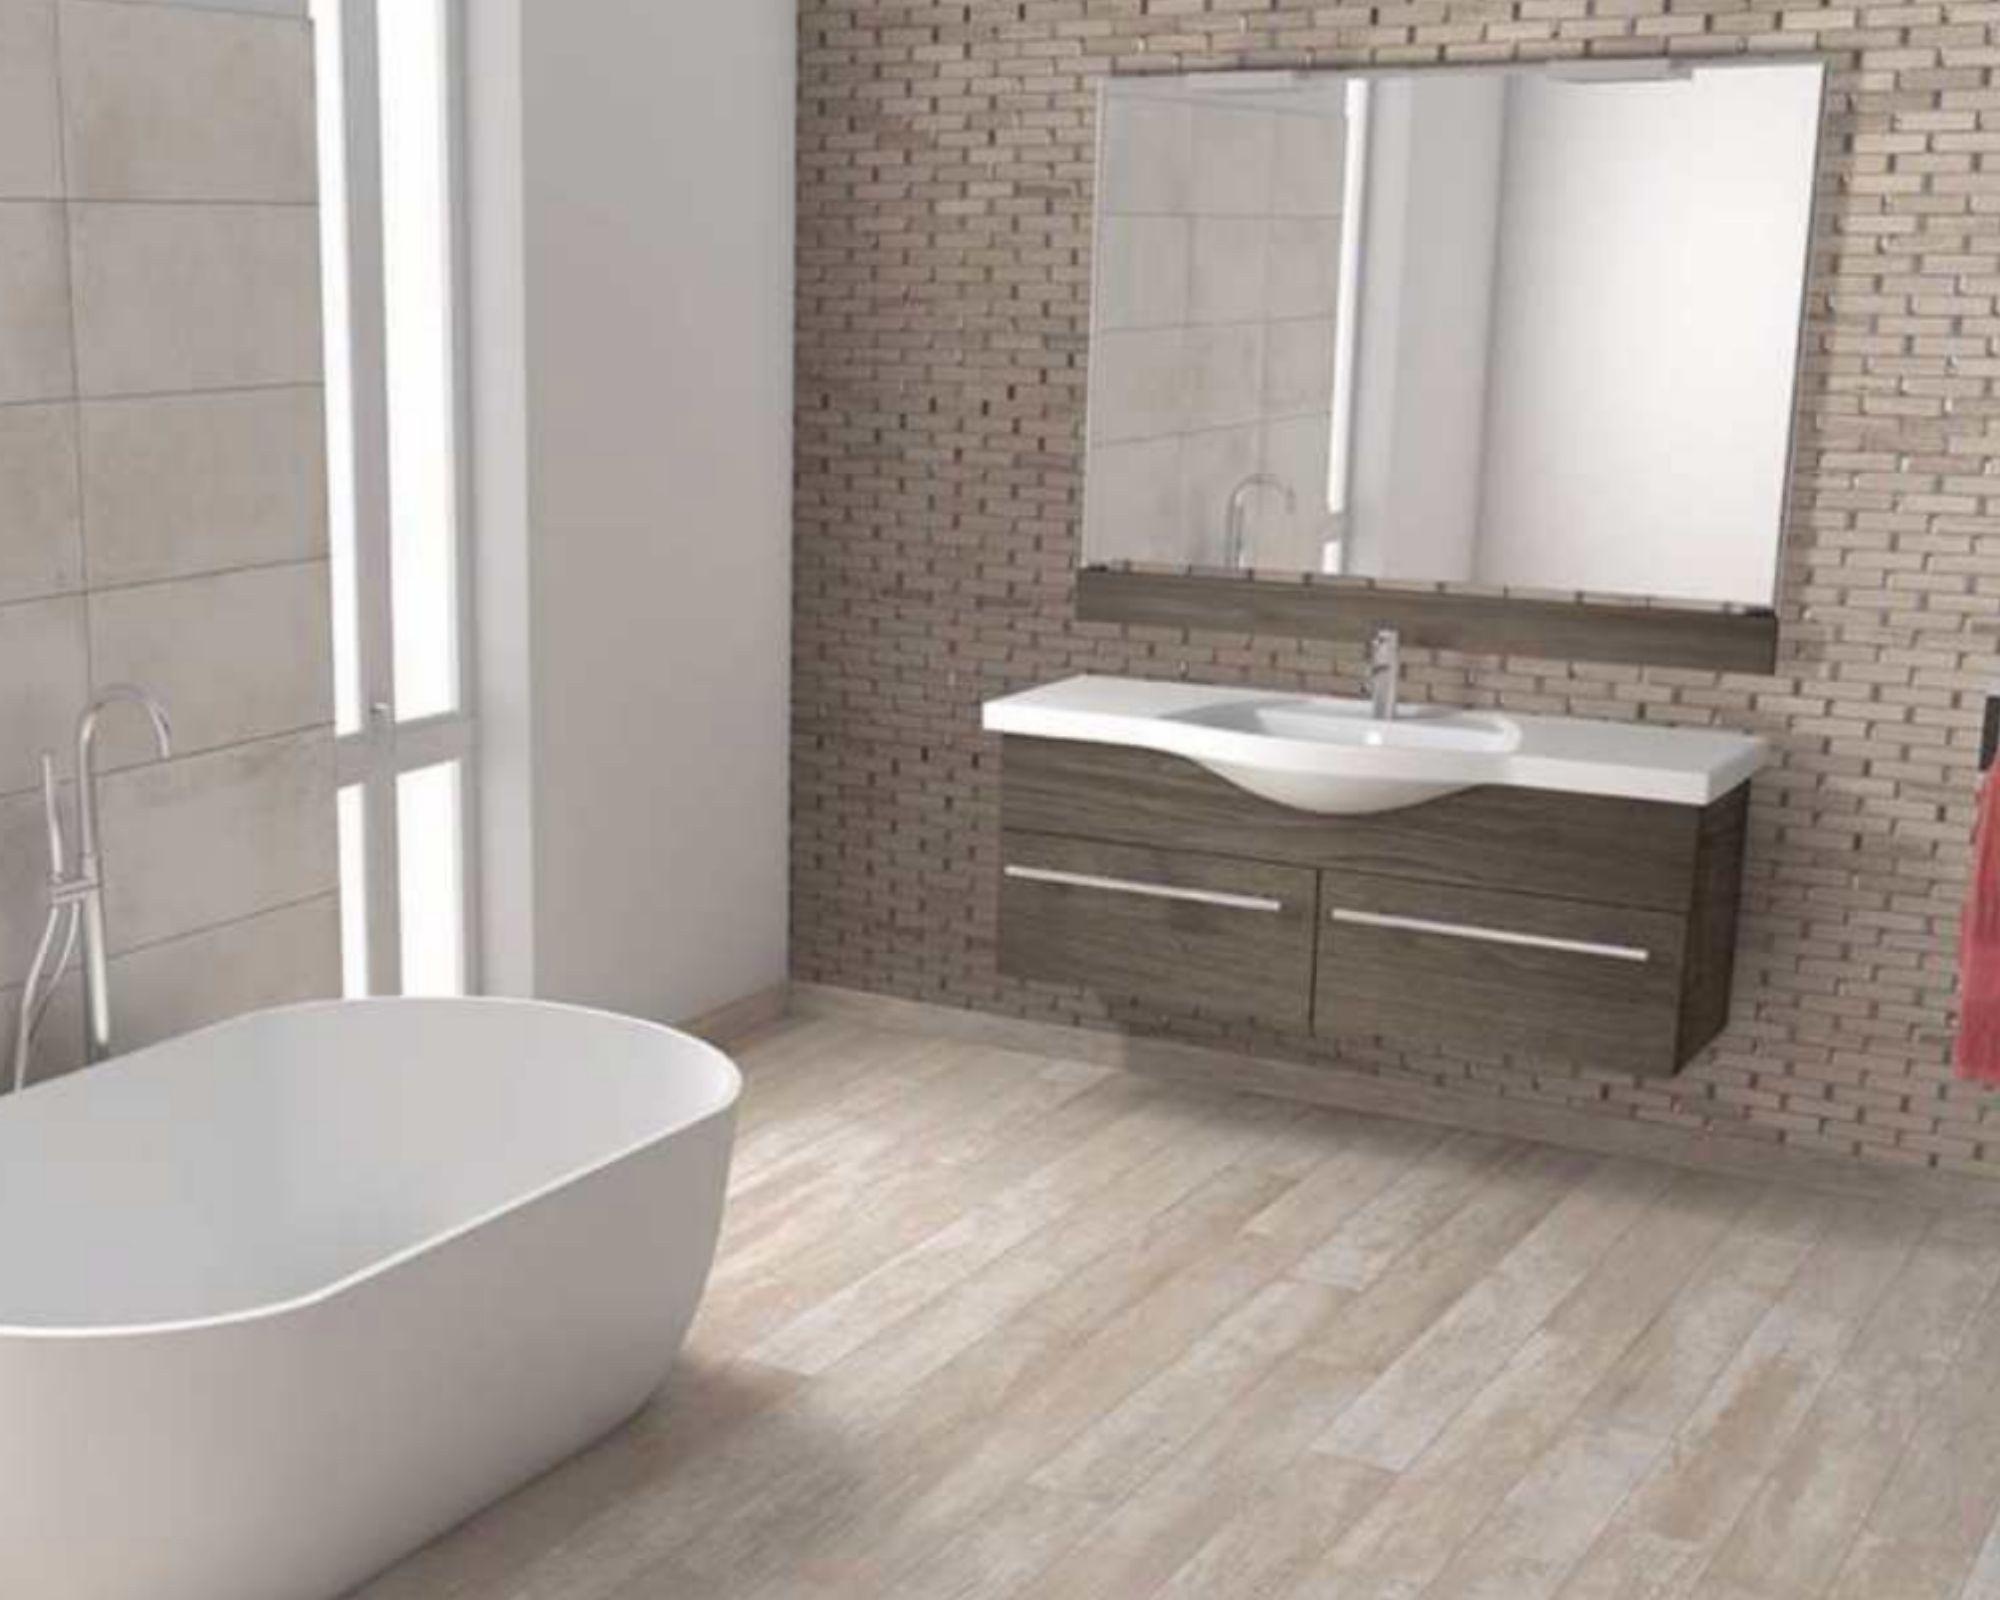 gorgeous bathroom glass and stone backsplash